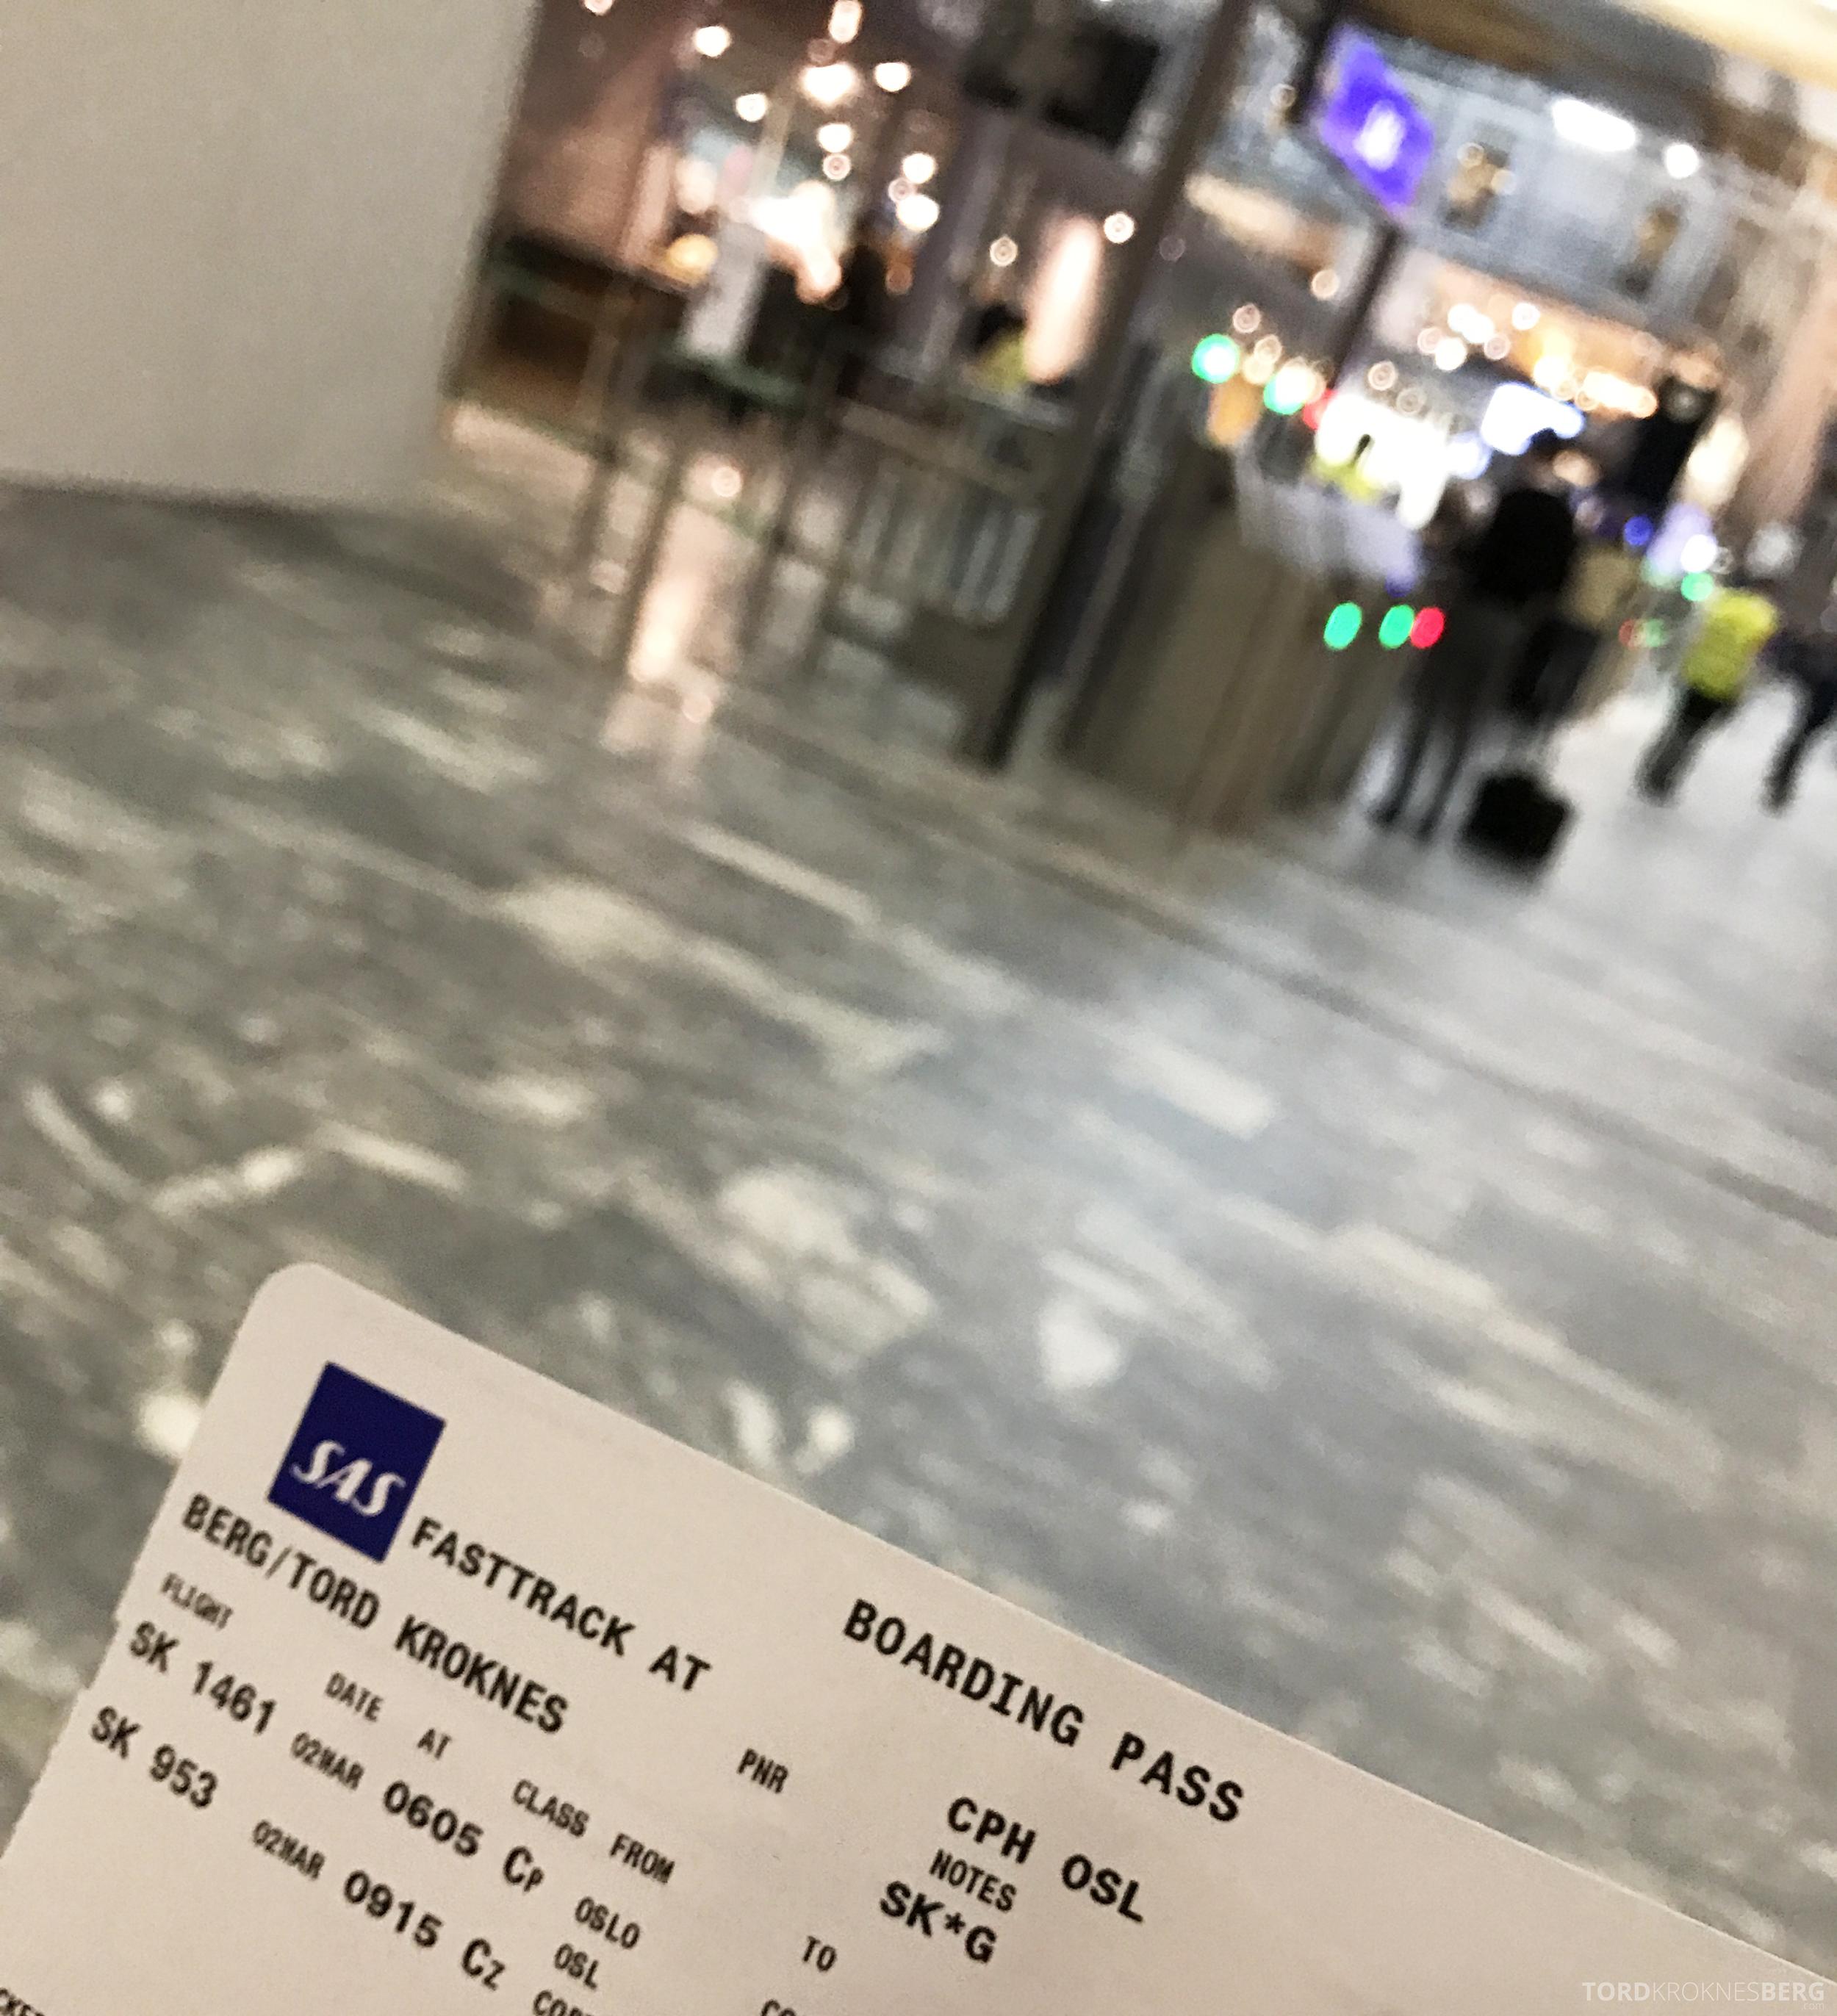 SAS Business Oslo til Miami fast track